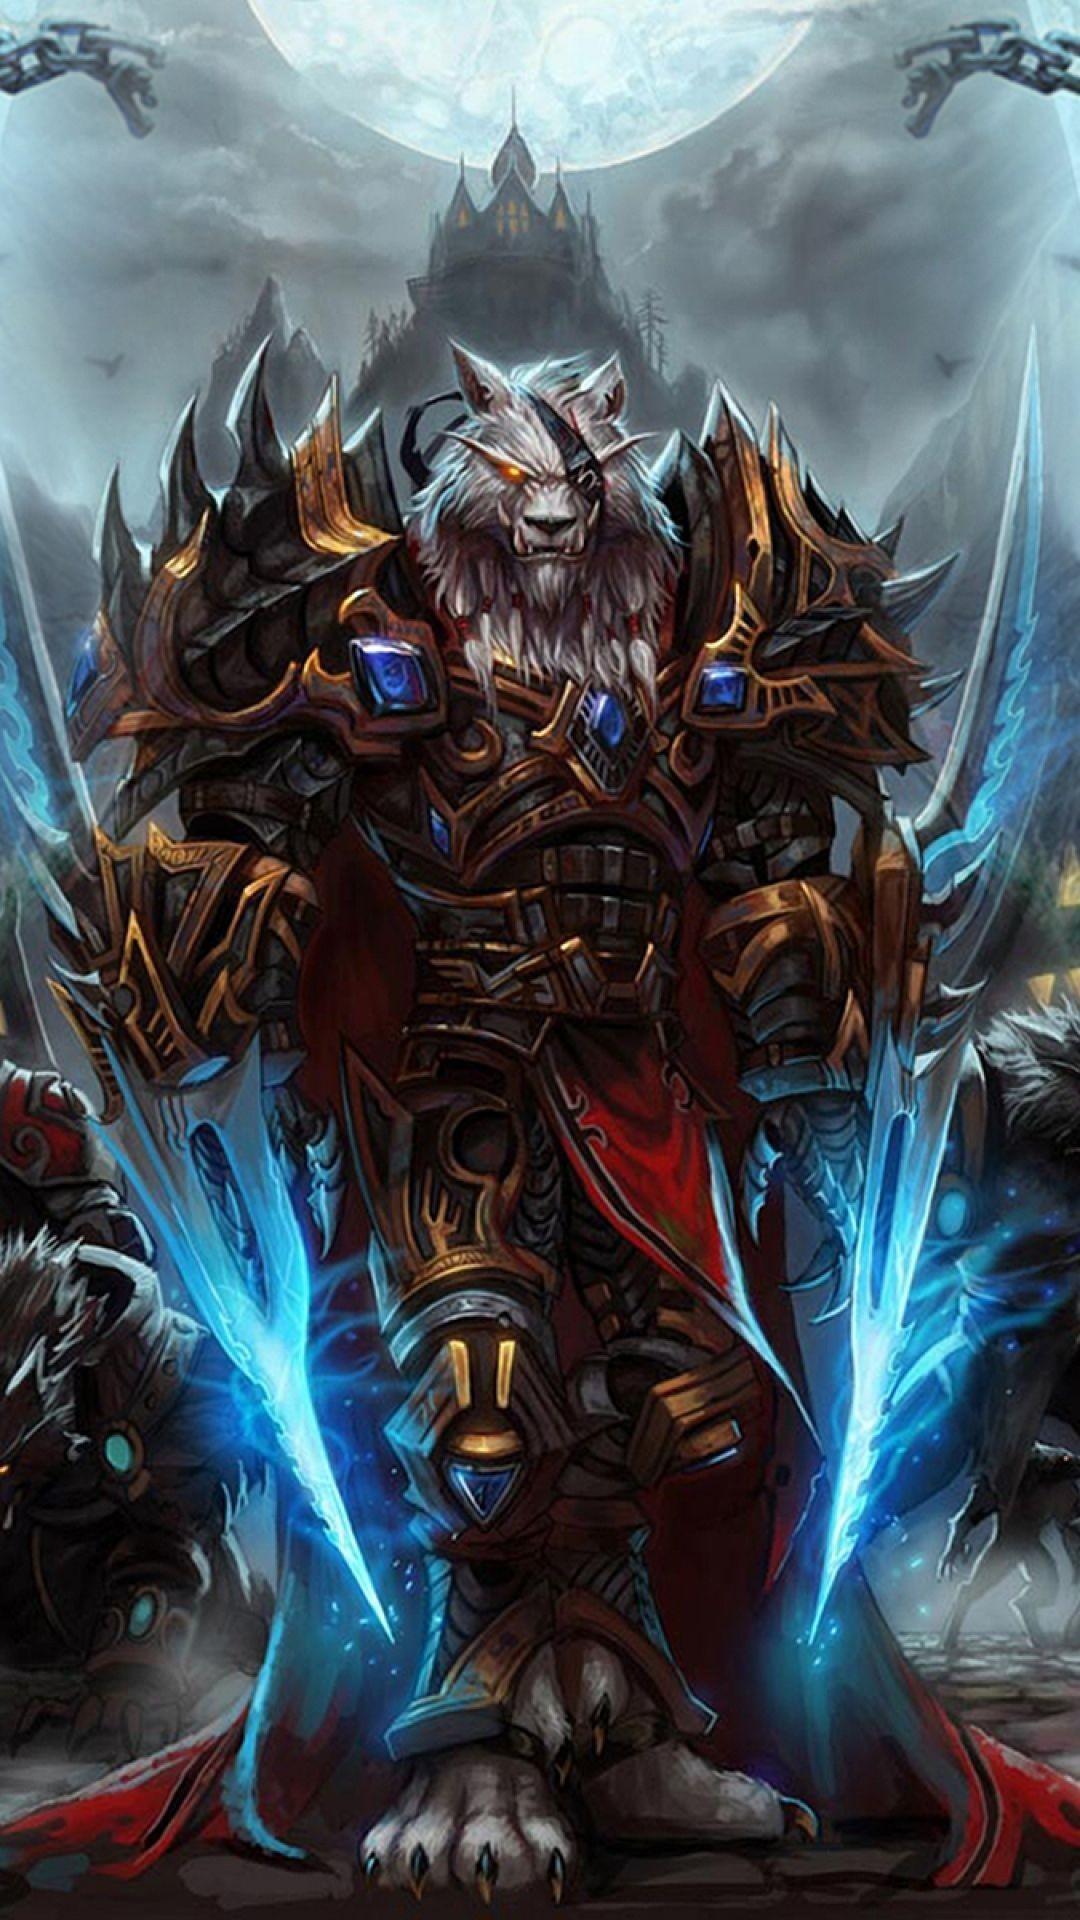 World Of Warcraft Death Knight samsung galaxy Wallpapers HD .